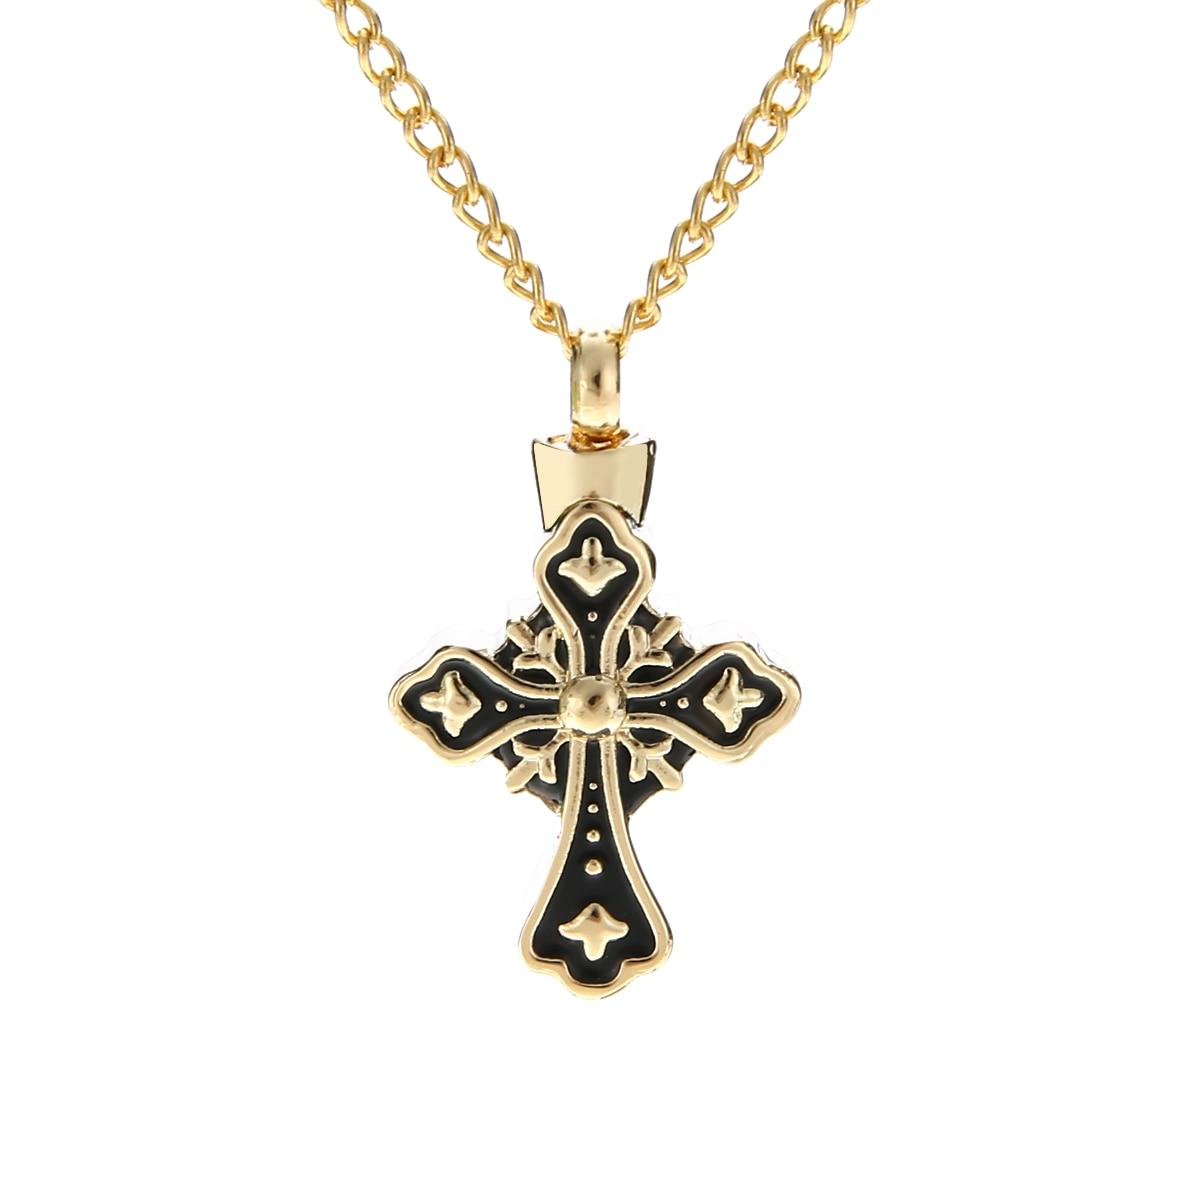 Vintage Urn Cremation Pendant Necklaces Shellhard Punk Ash Holder Mini Keepsake Long Chain Necklace Women Memorial Jwewelry